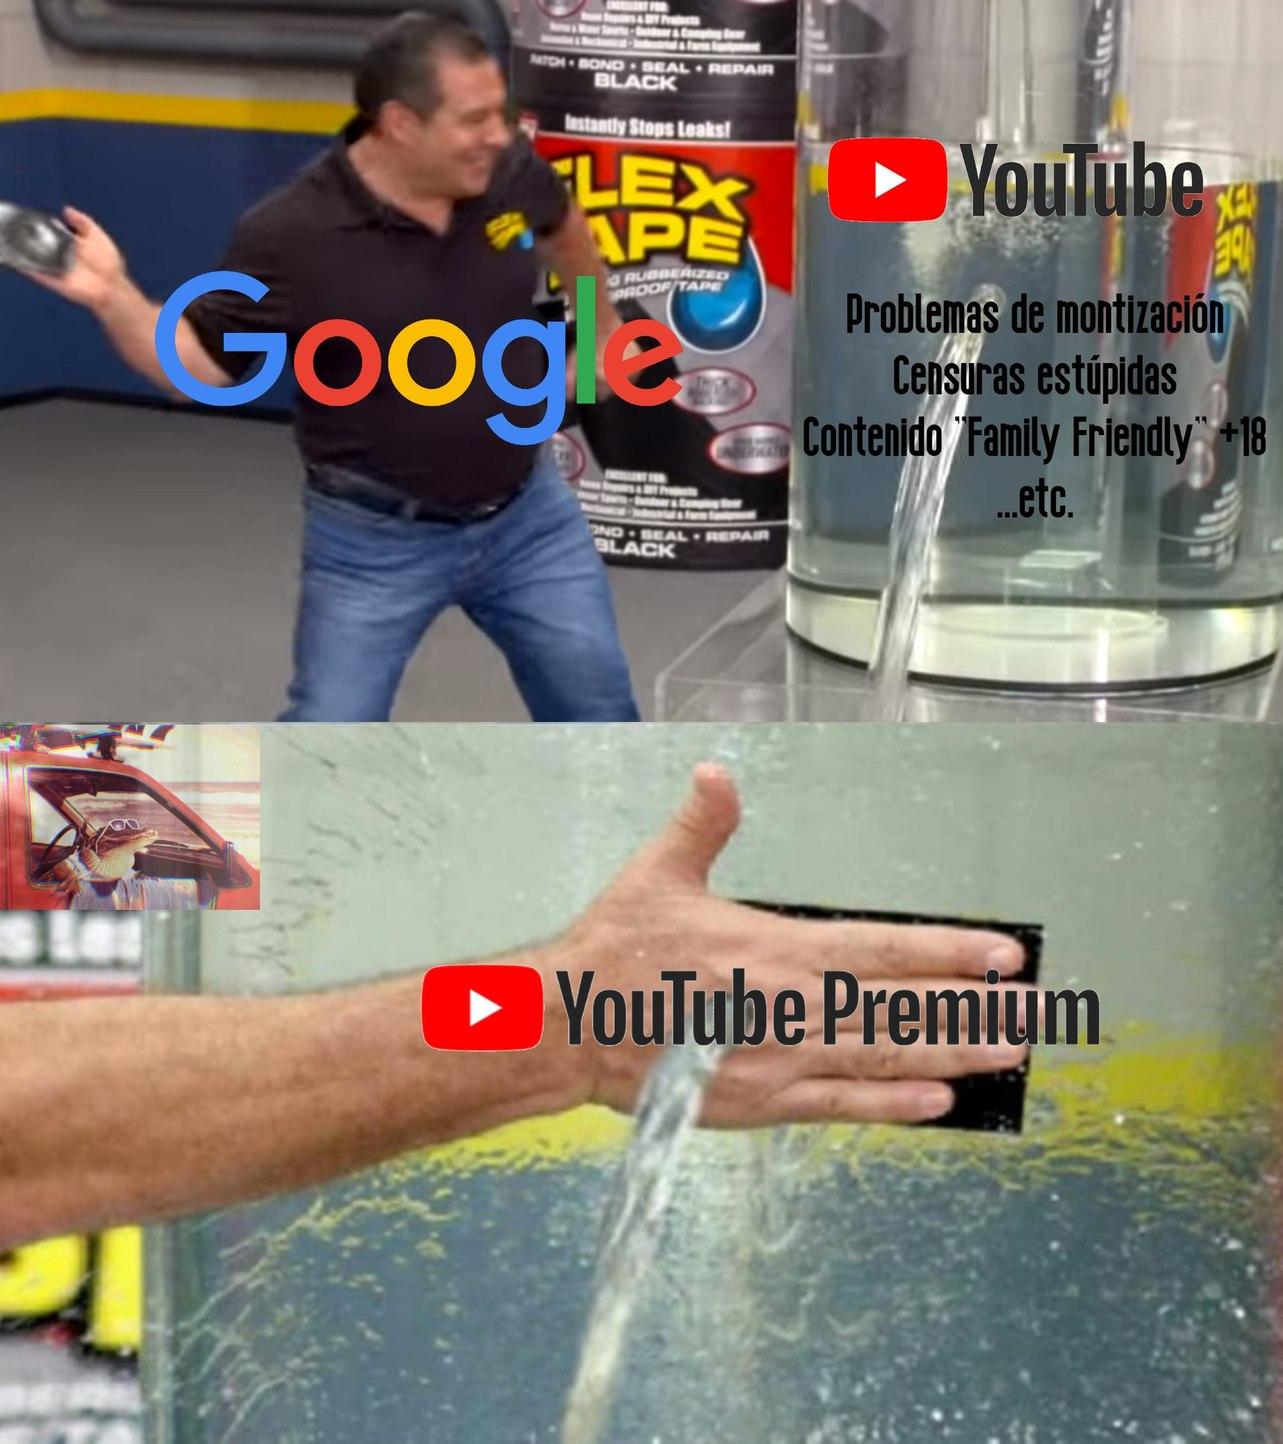 Inútilidad nivel 1000 - meme